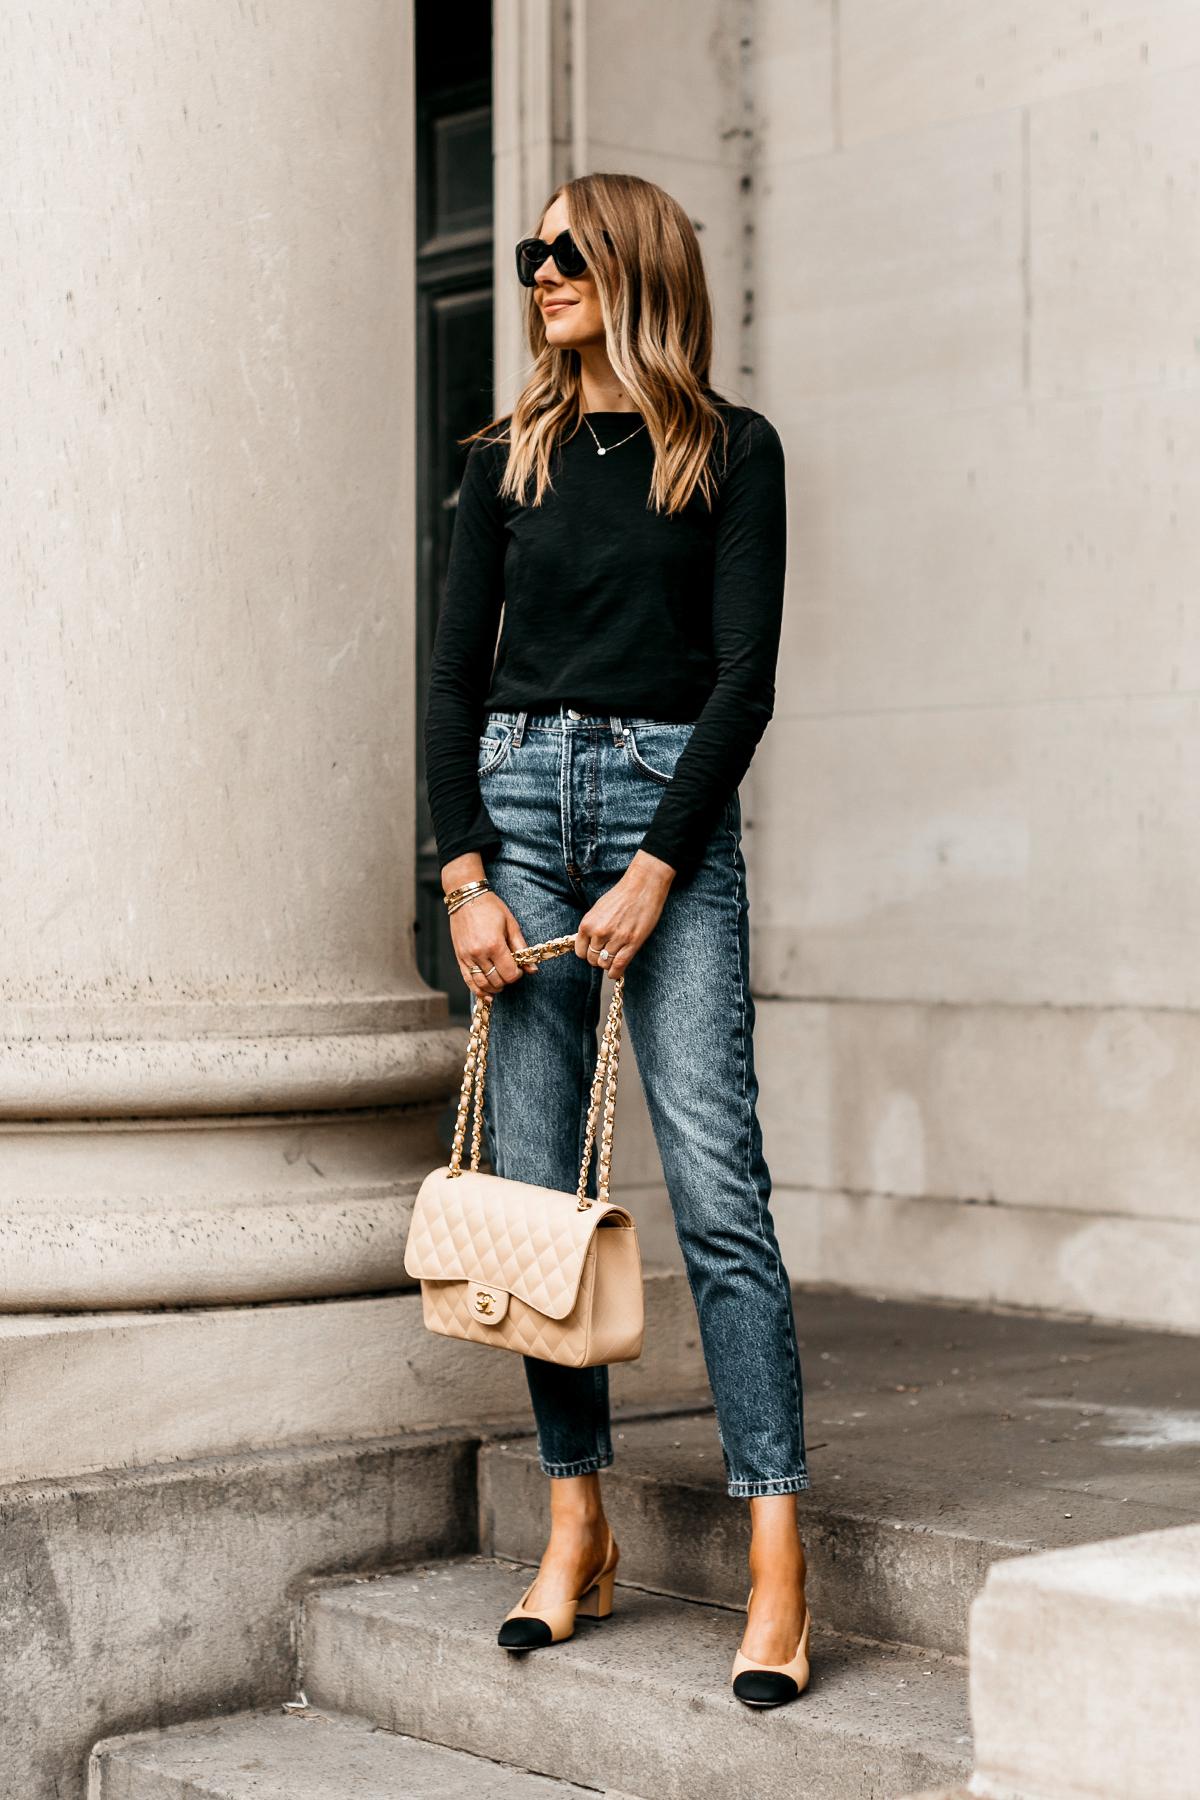 Fashion Jackson Wearing Madewell Black Long Sleeve T-Shirt Anine Bing Sonya High Waist Slim Jeans Chanel Slinbbacks Chanel Beige Jumbo Handbag